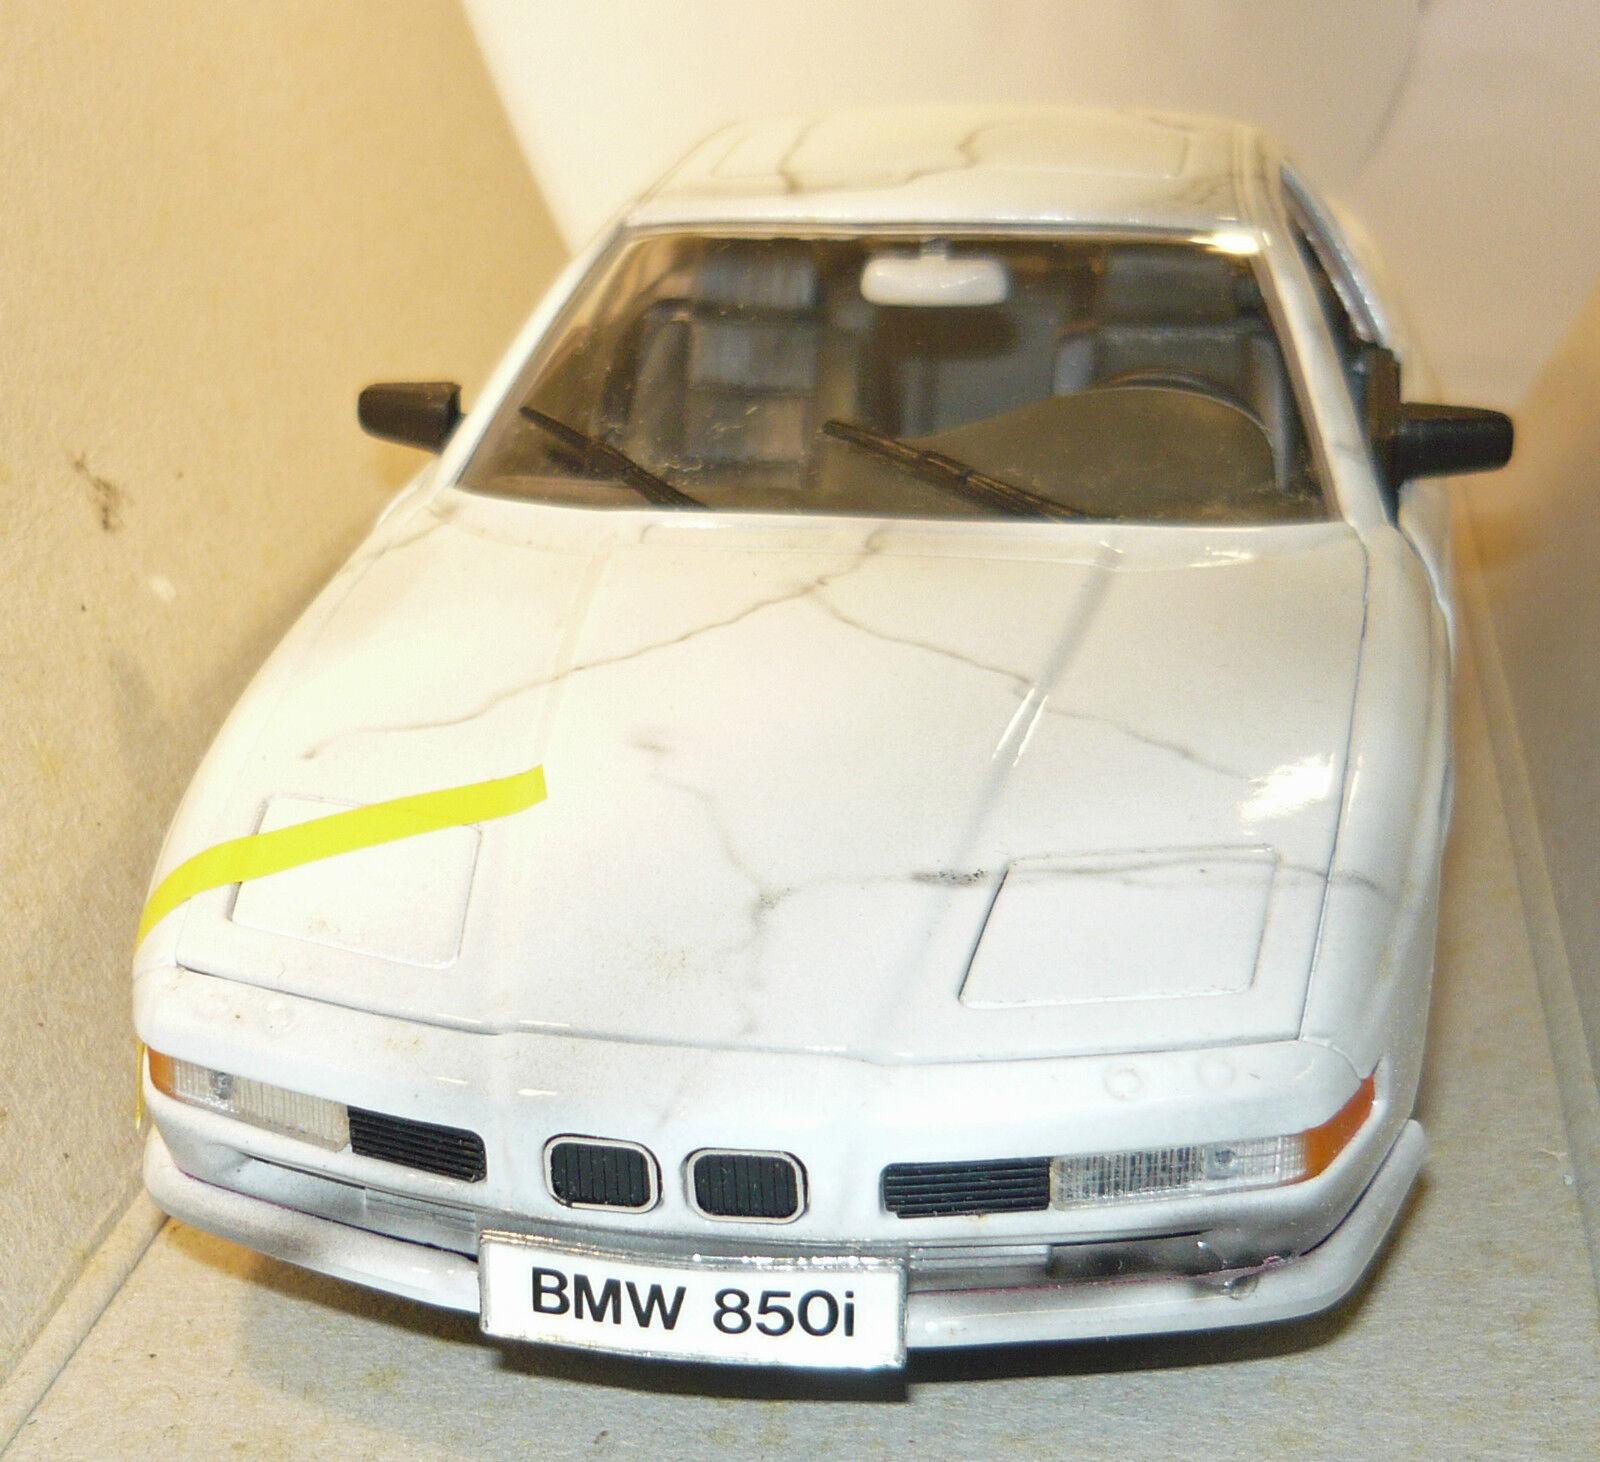 BRACCIO & Götz 553 007, BMW 850i (1990) Marble motif, hand painted, rare, 1 18,NEU&OVP